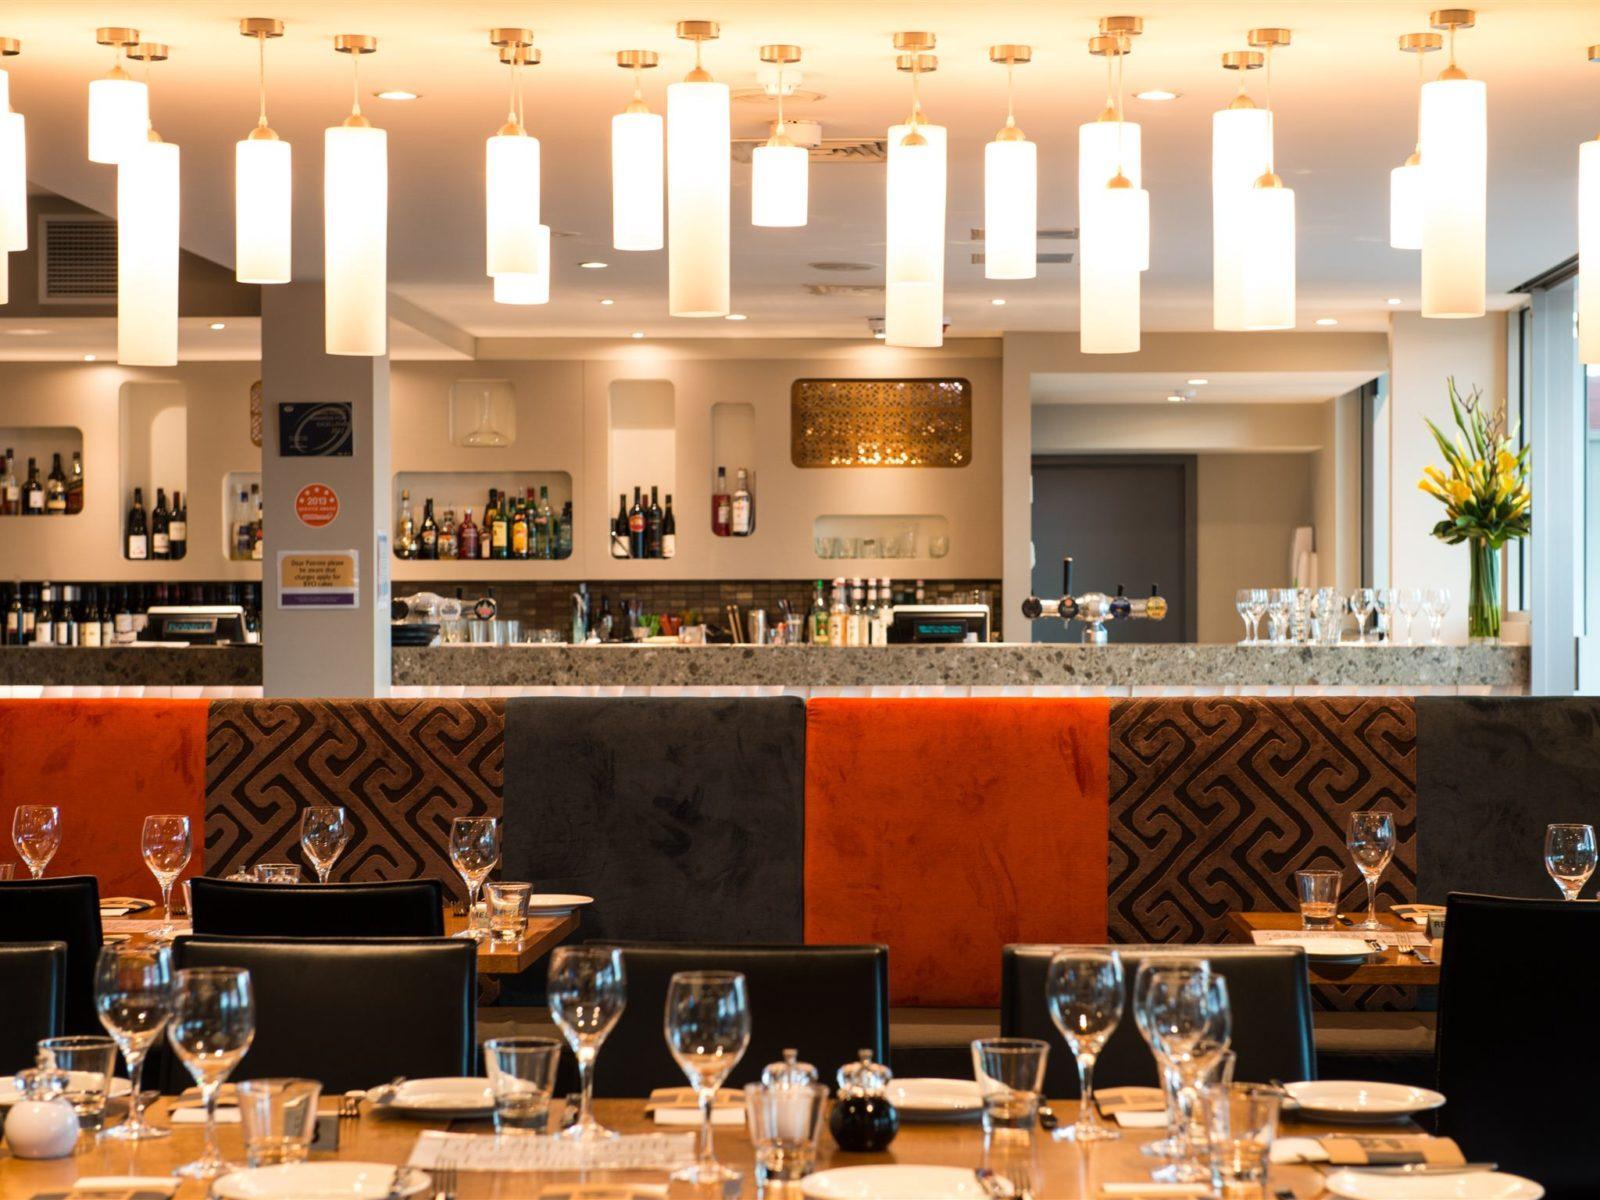 Beltana Hotel - Bar & Dining